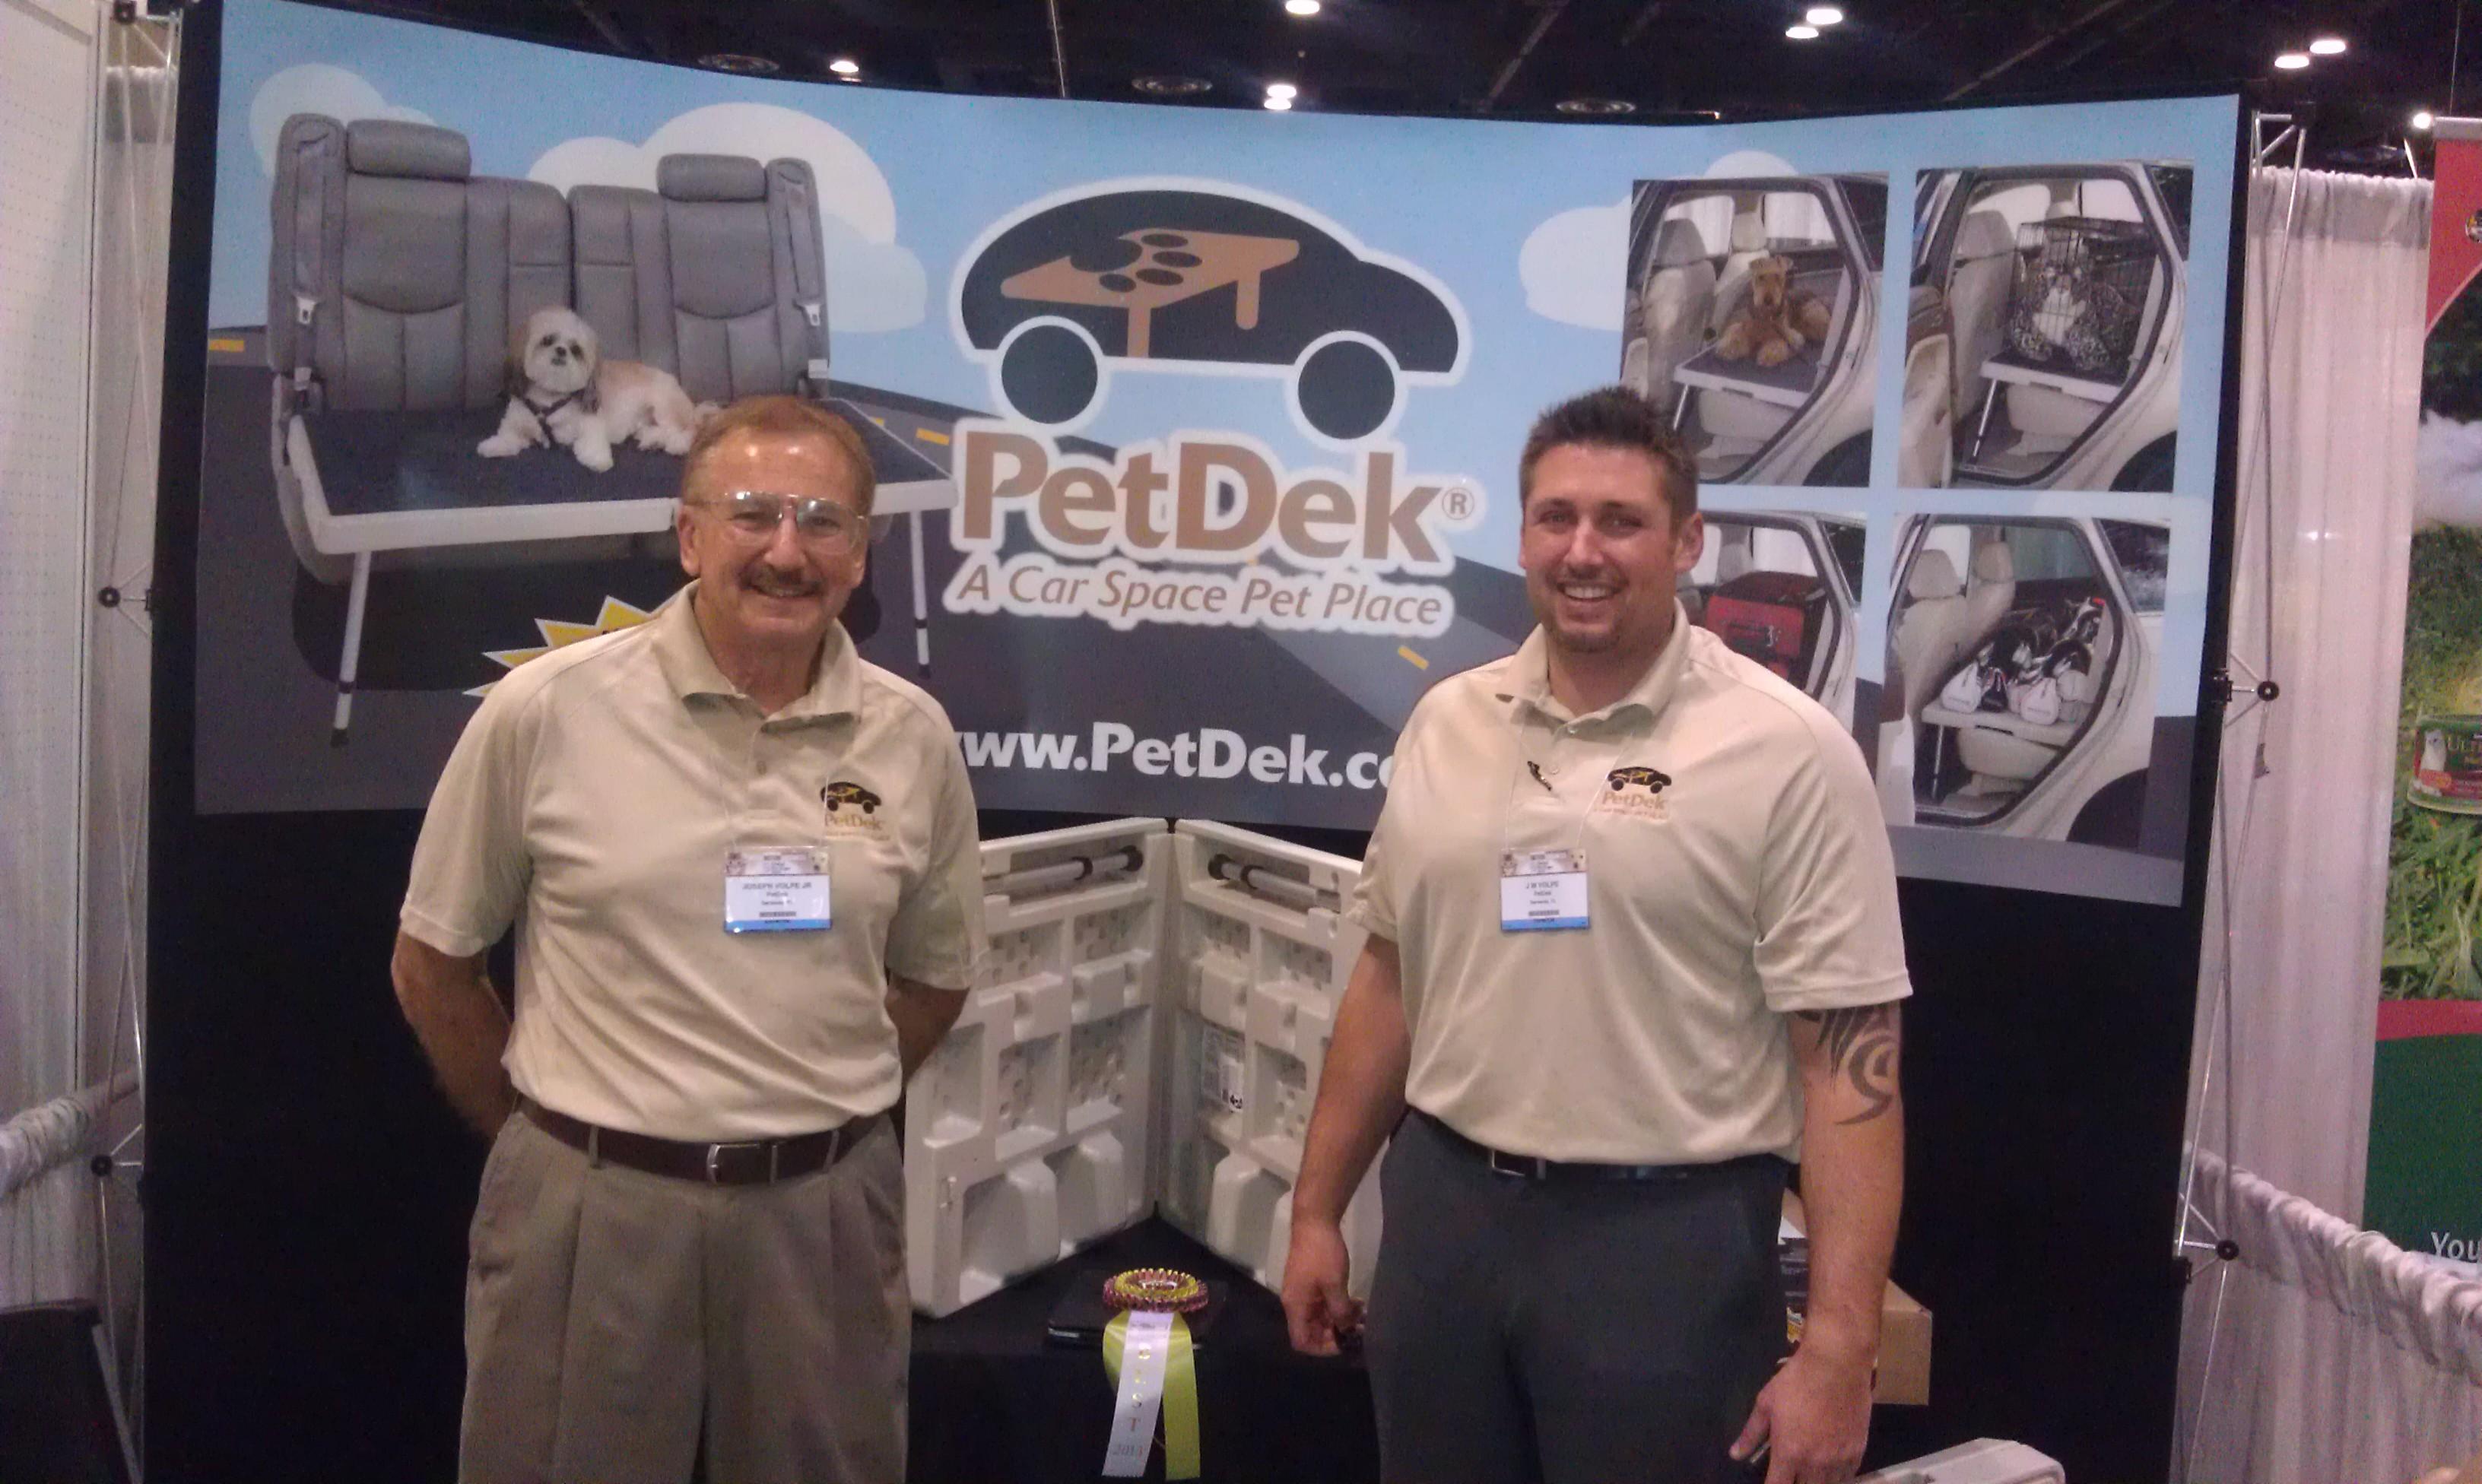 SK Resident Inventor of the PetDek